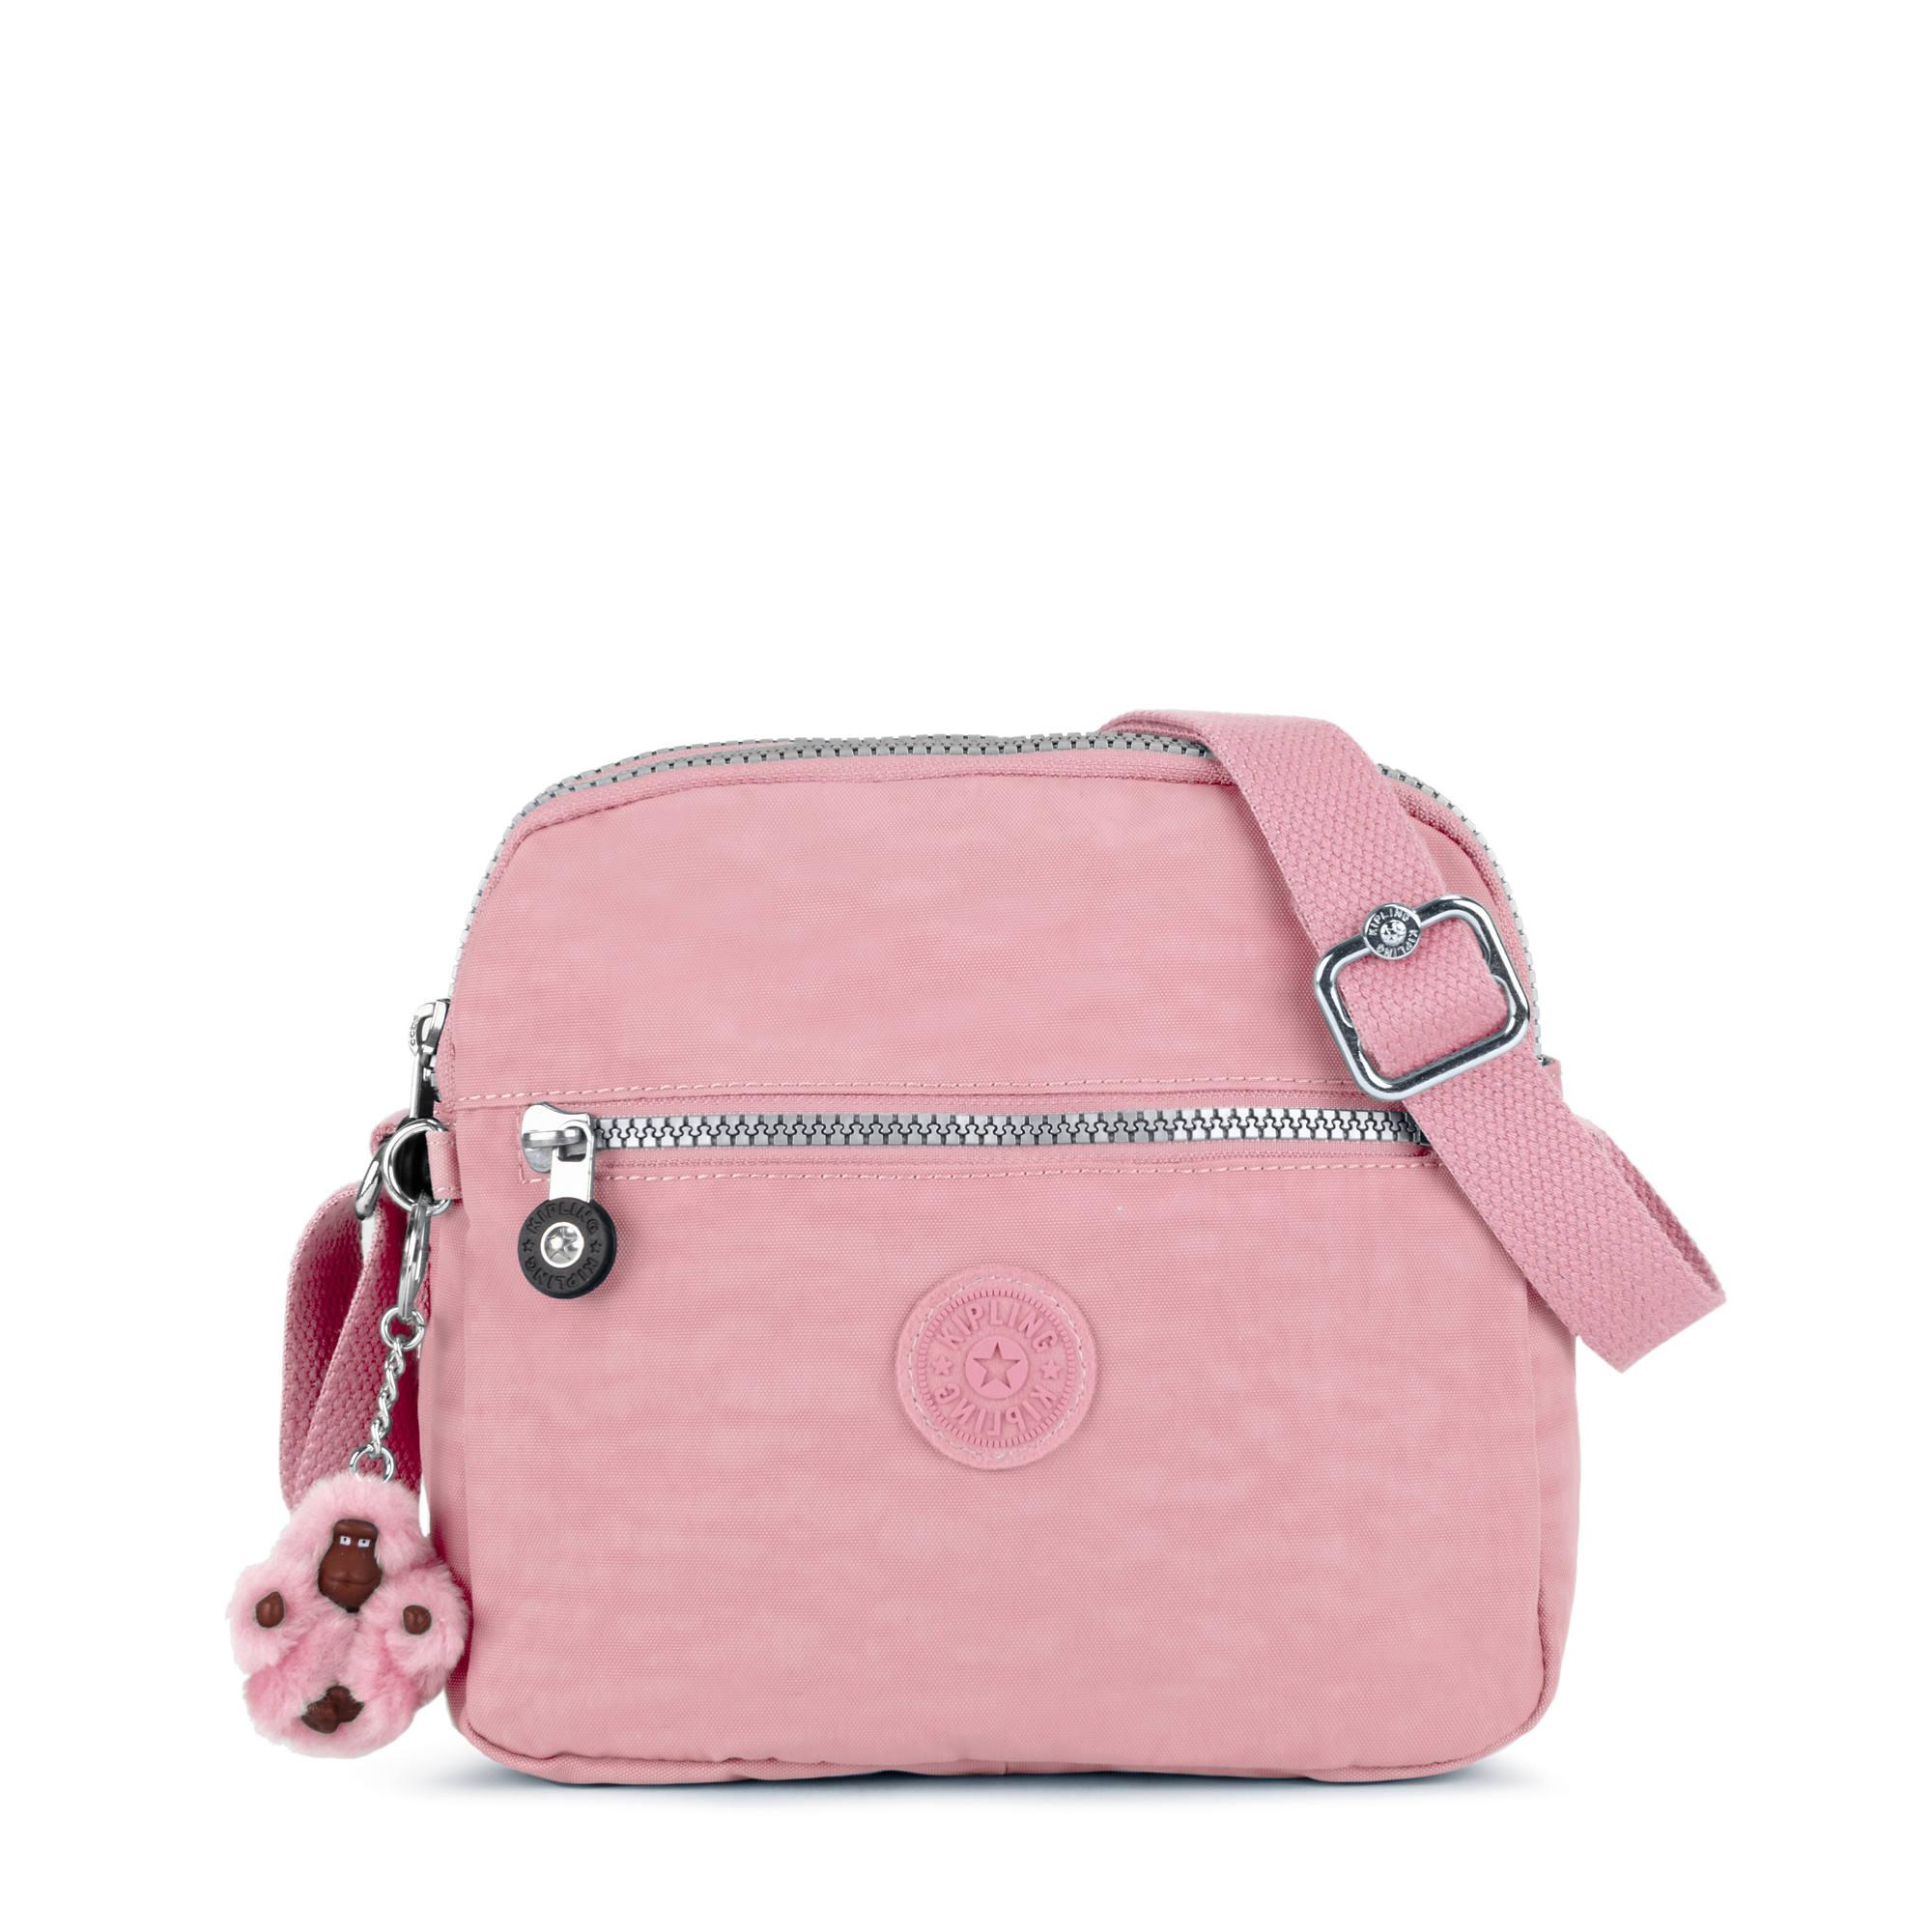 9c0f82ddbc8 Kipling: Keefe Crossbody Bag $30 & Other Limited Sale Items ...